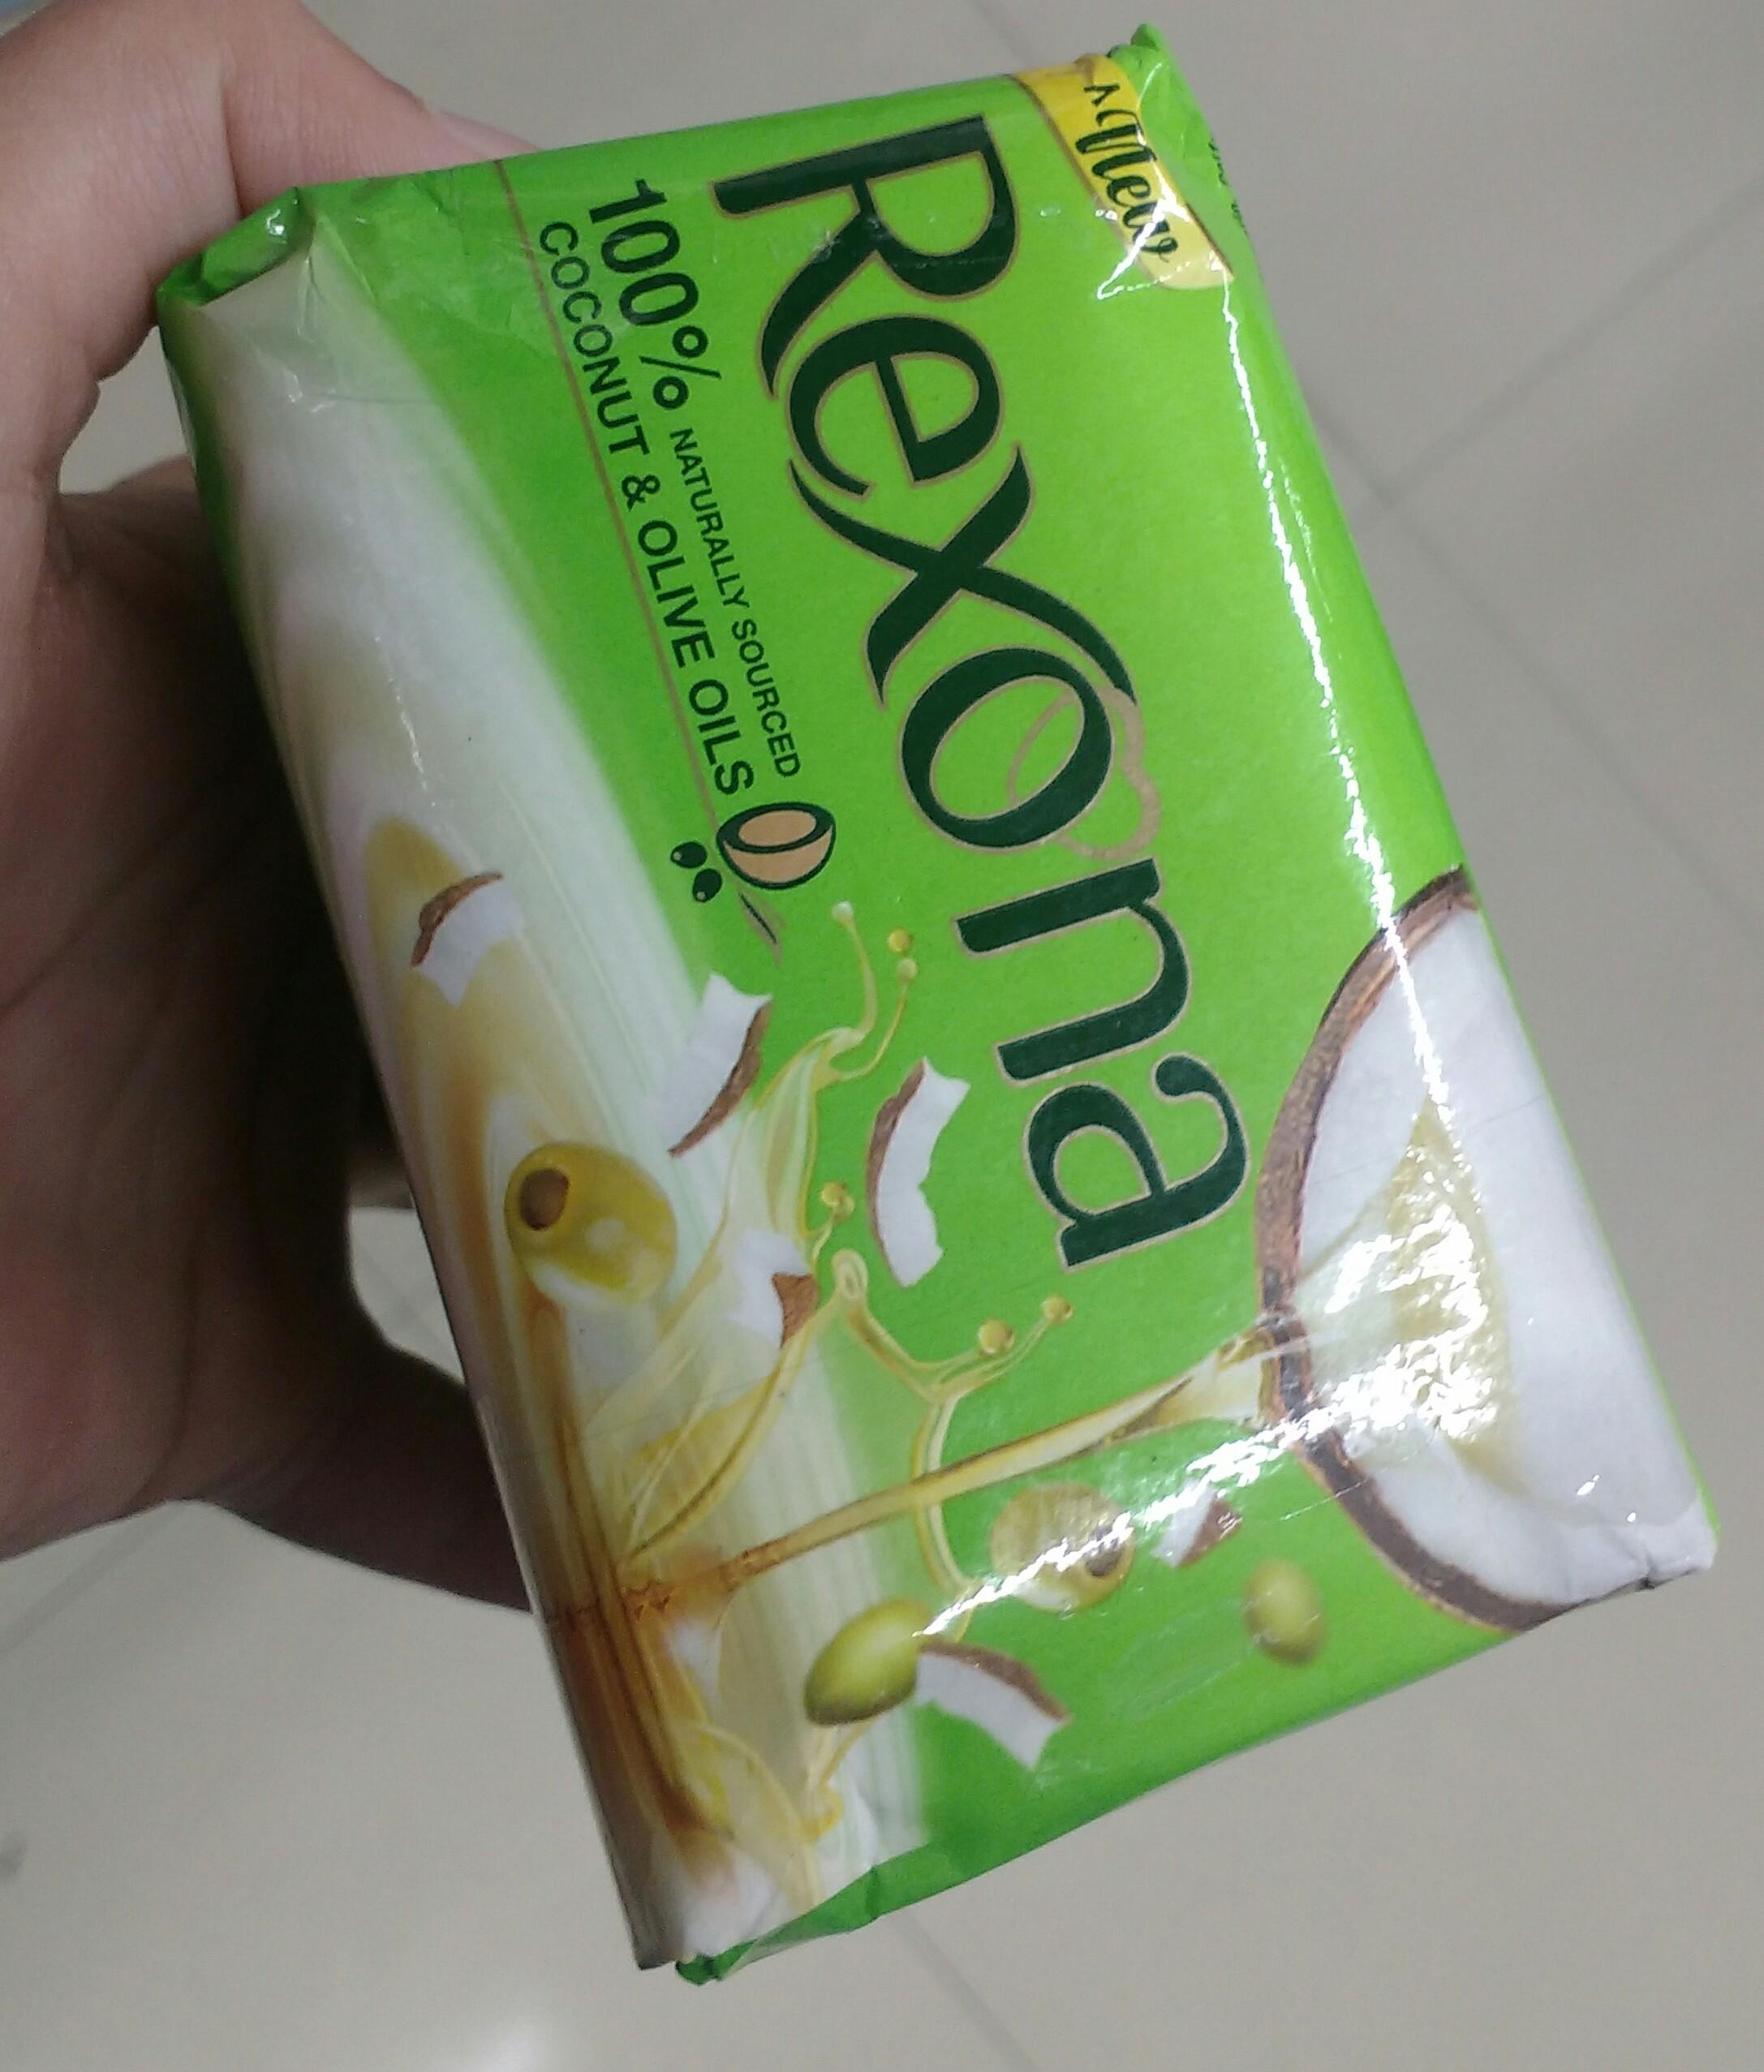 Rexona Soap-Rexona Soap-By ashwini_bhagat